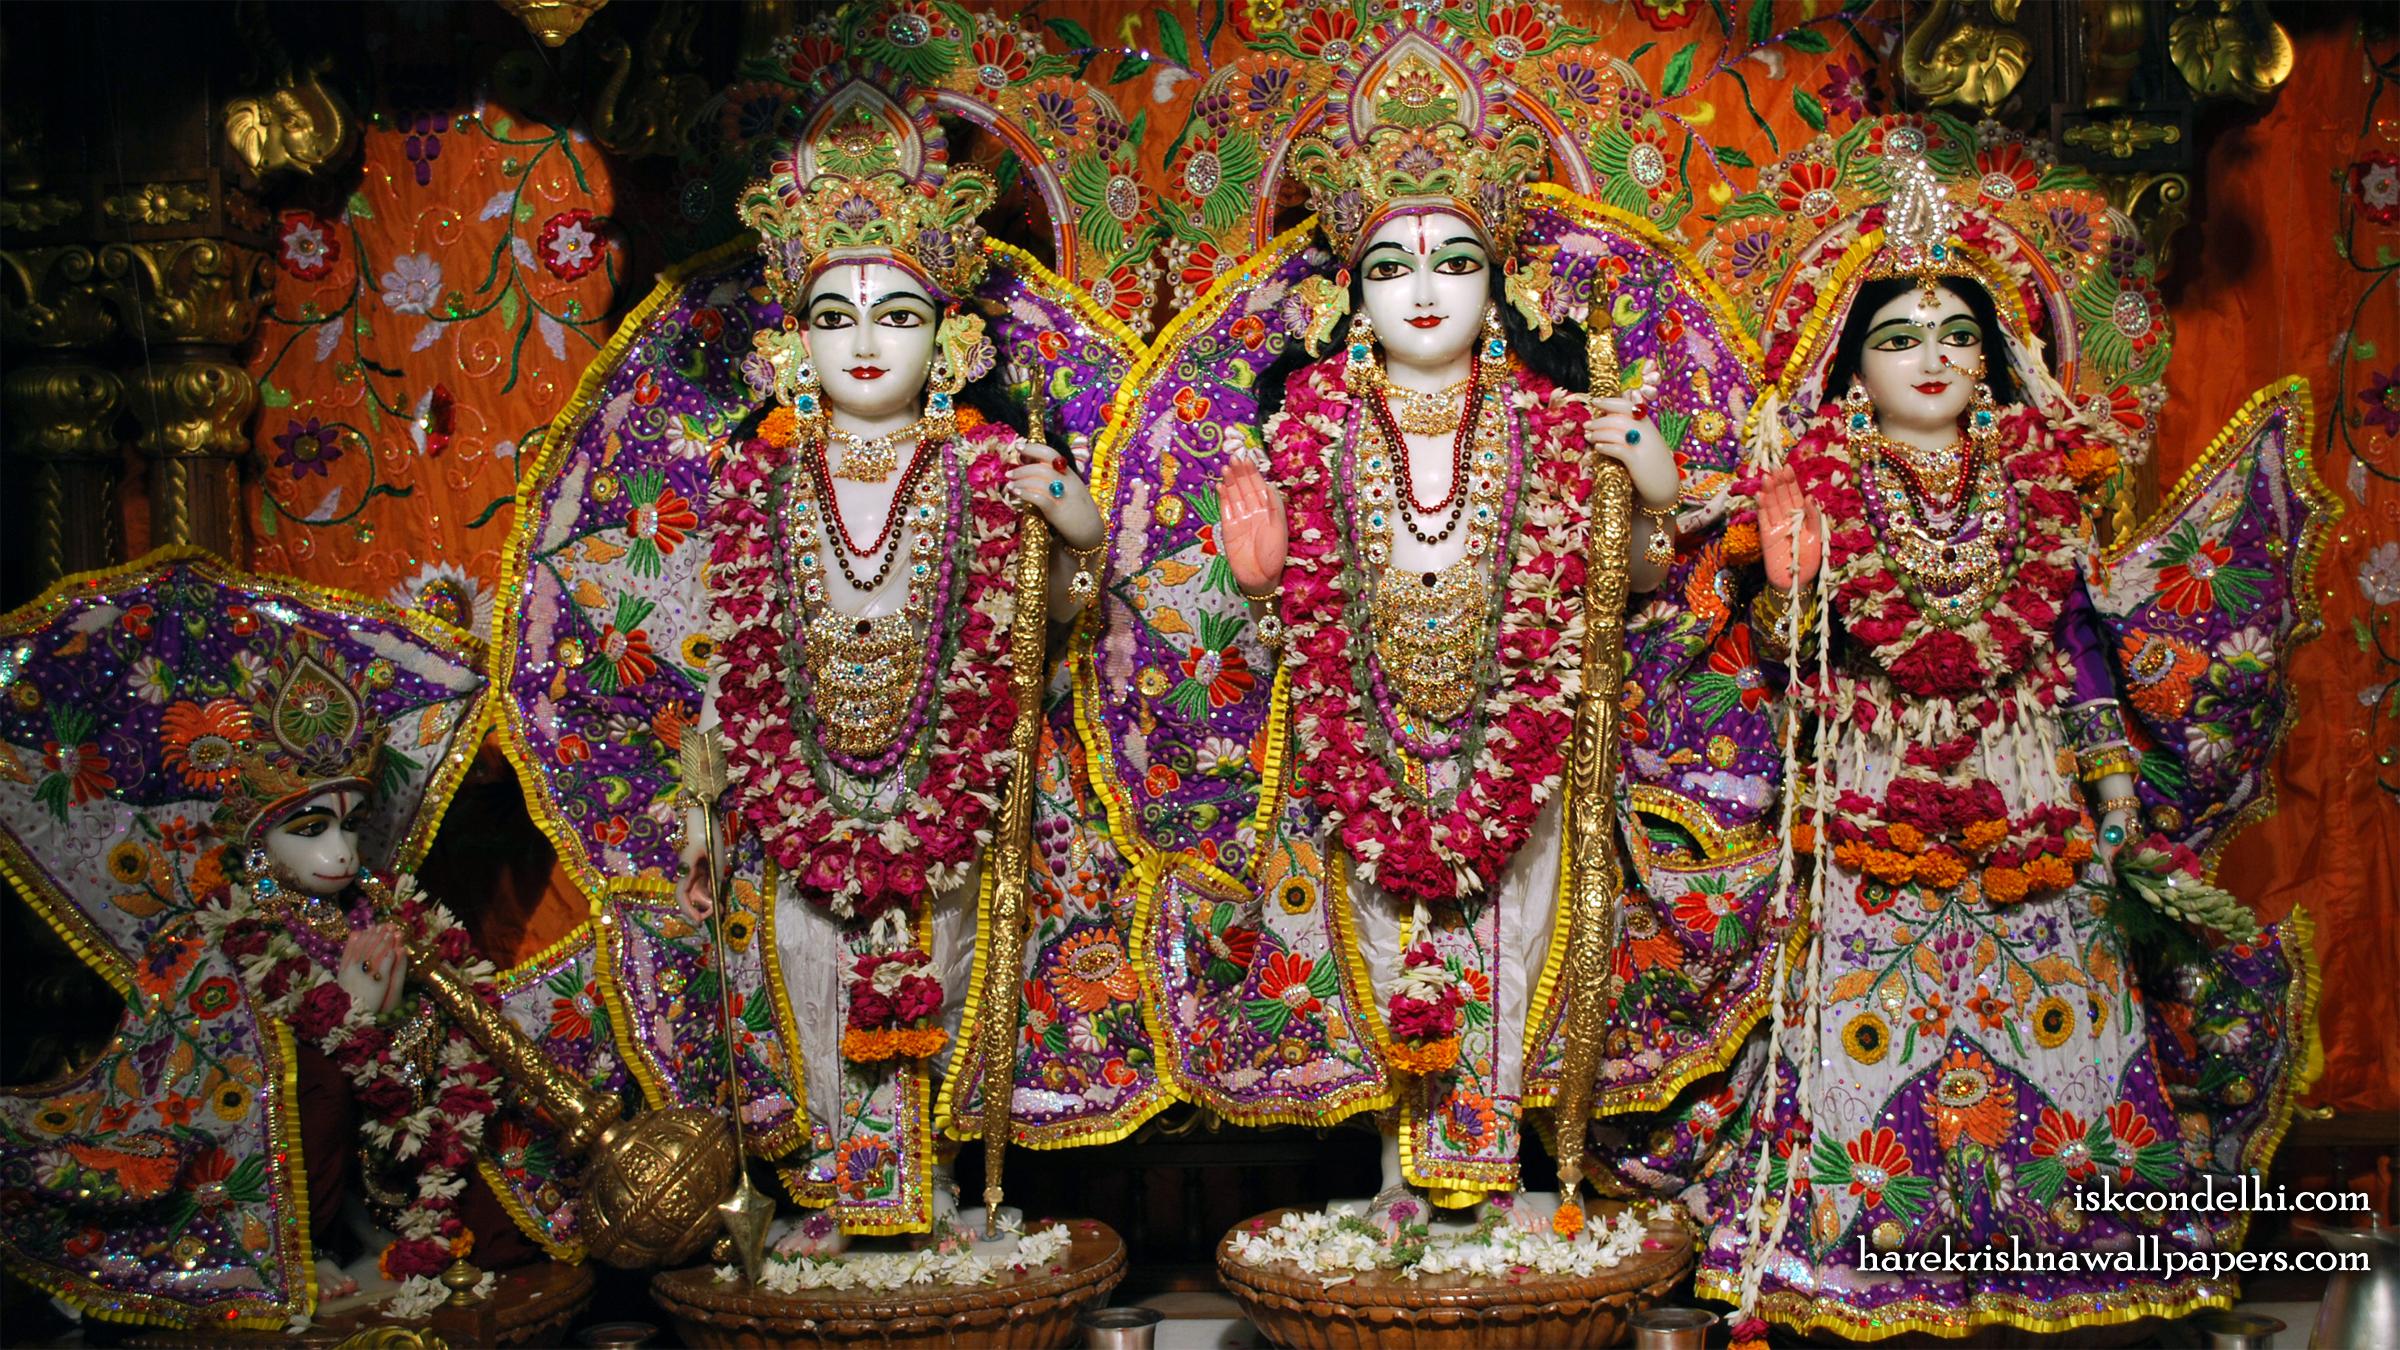 Sri Sri Sita Rama Laxman Hanuman Wallpaper (013) Size 2400x1350 Download